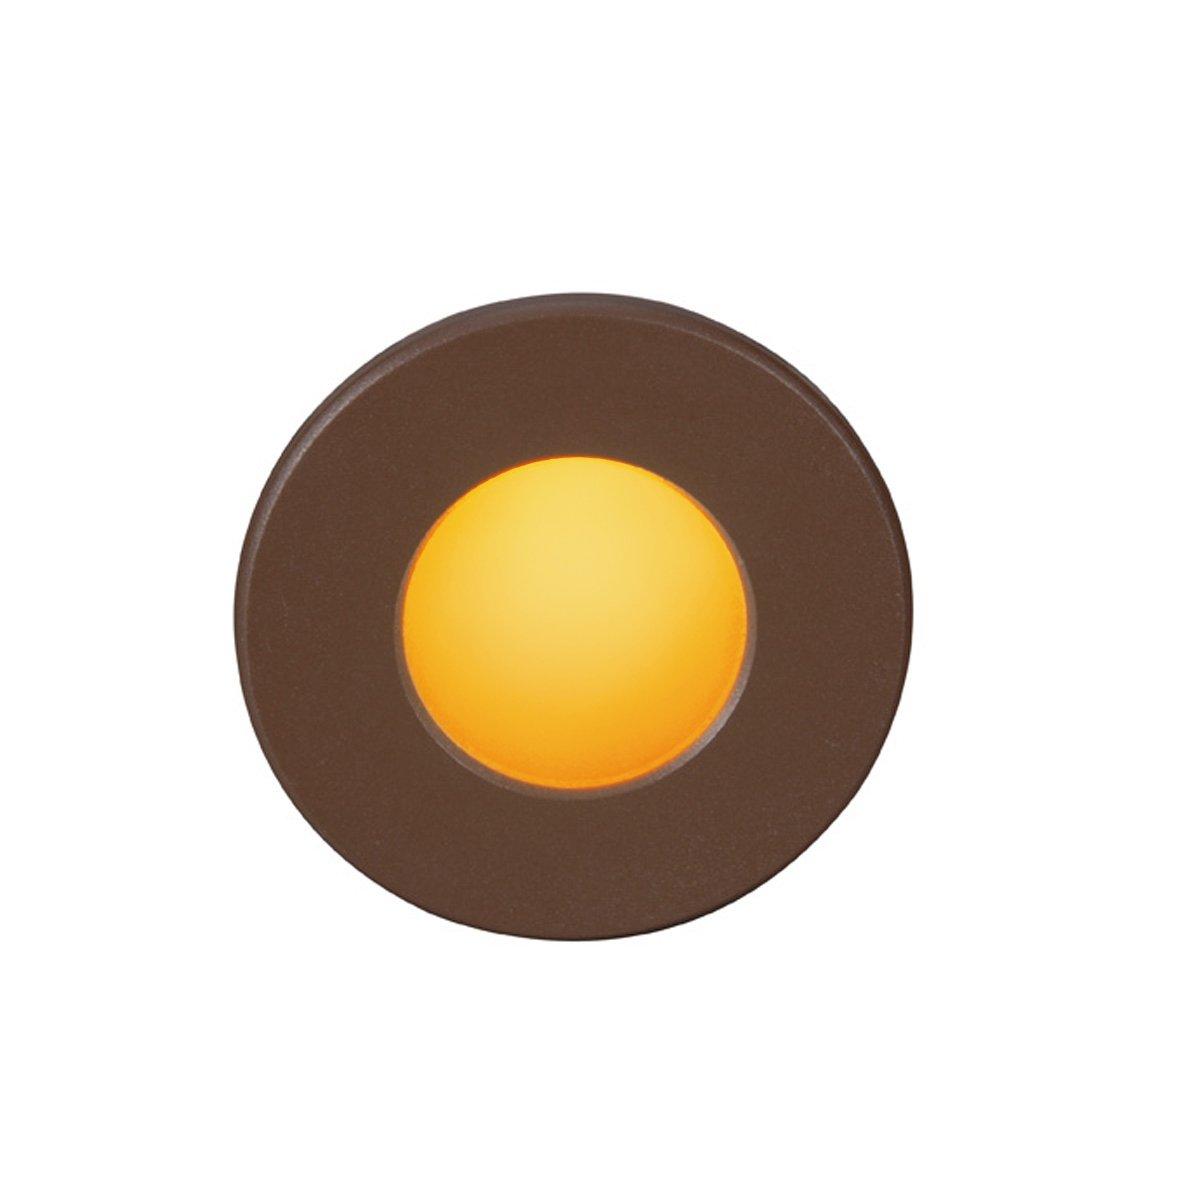 WAC Lighting WL-LED310-AM-BZ Ledme Full Round Amber Step and Wall Light, Bronze